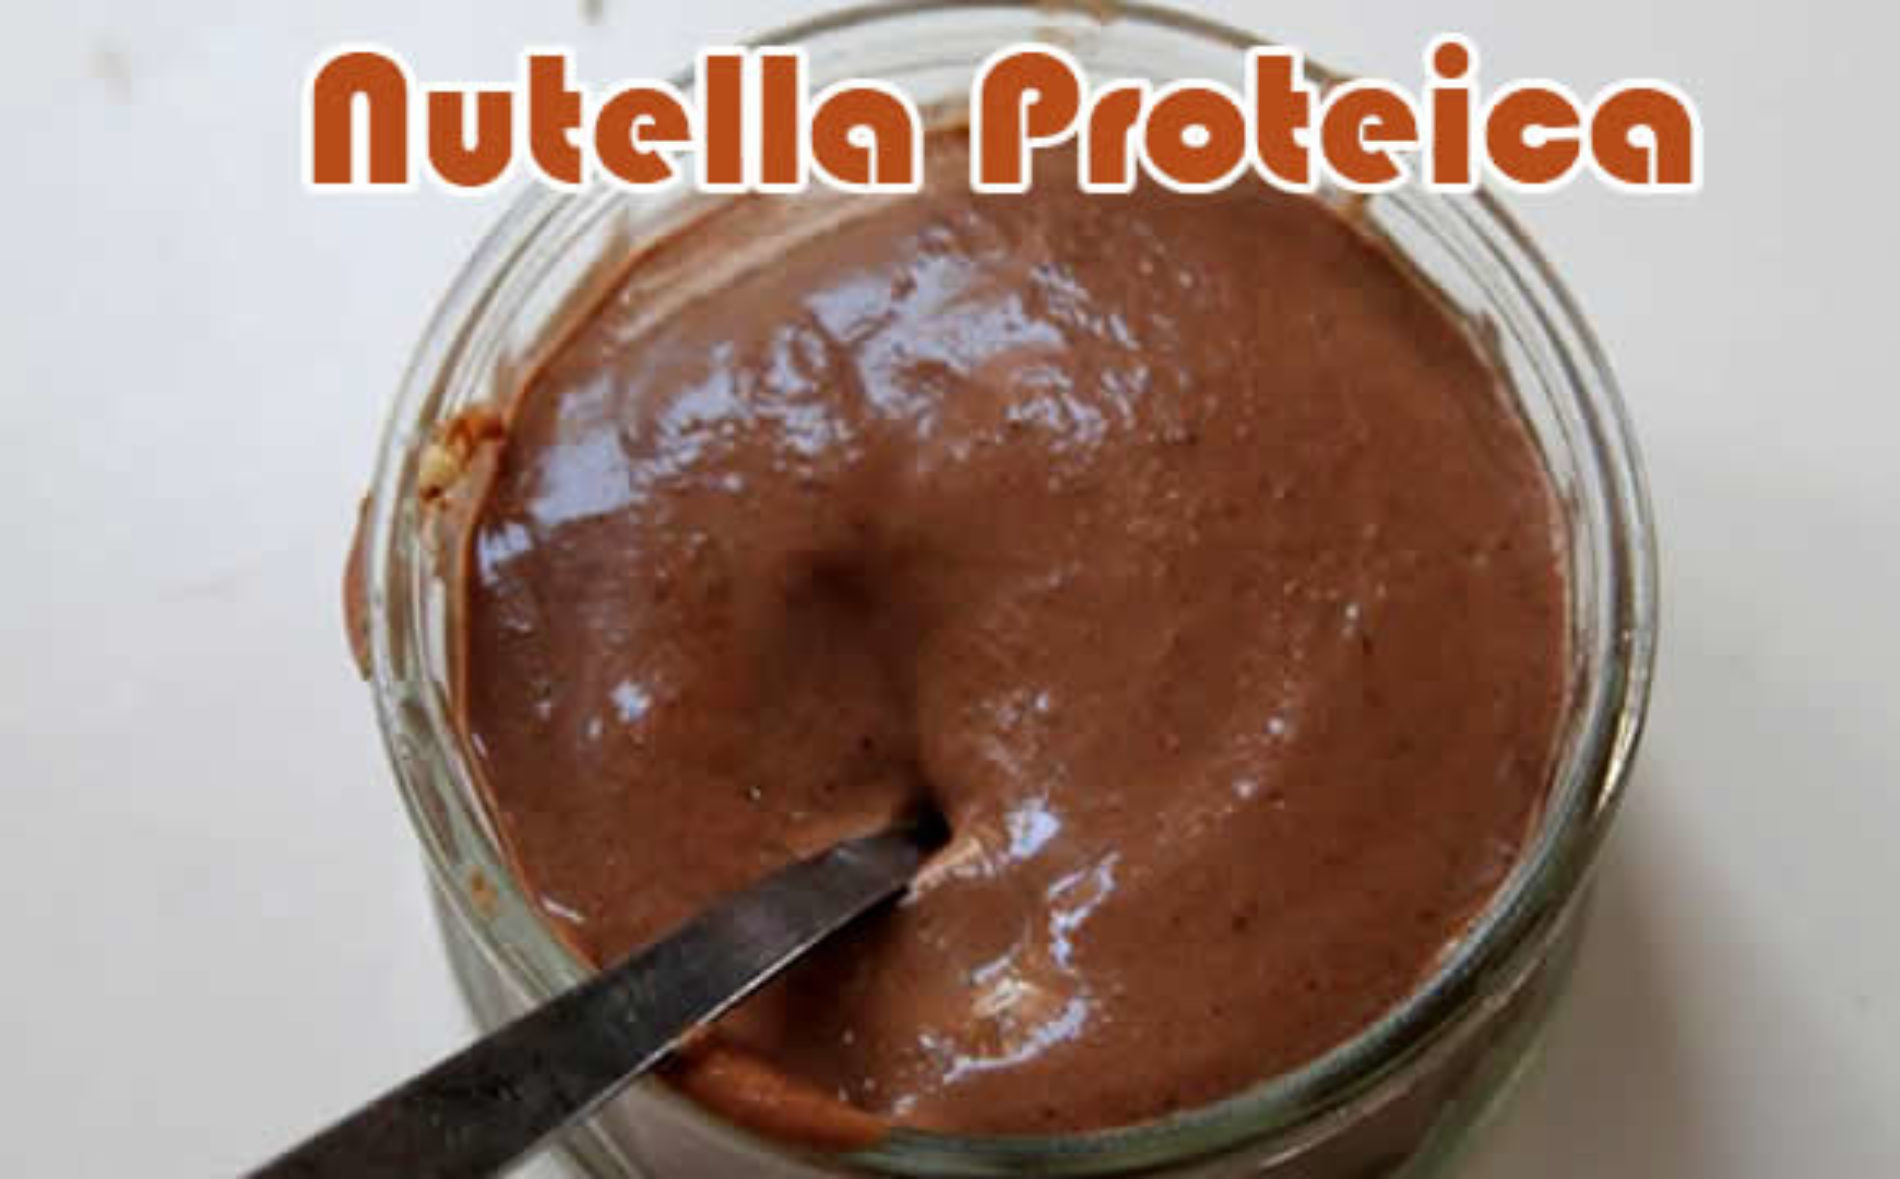 Nutella Proteica